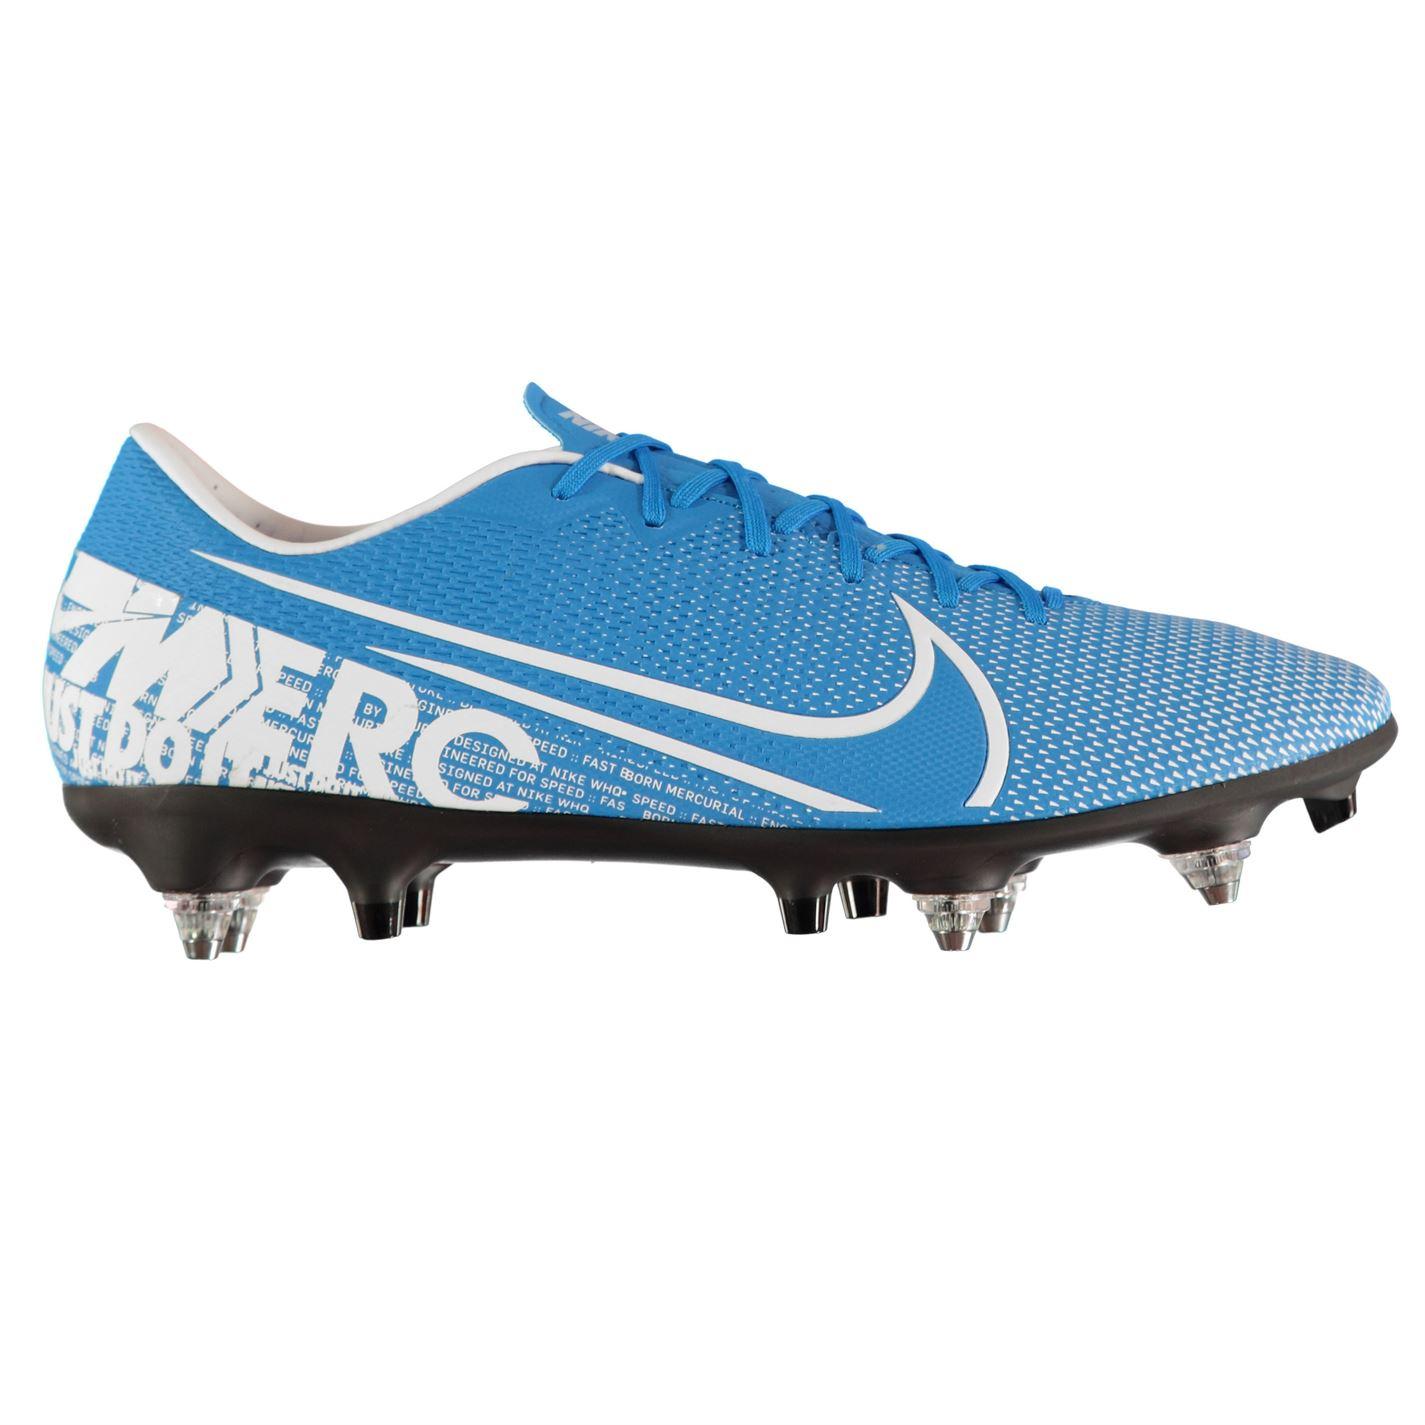 Nike Mercurial Vapor Academy Mens SG Football Boots